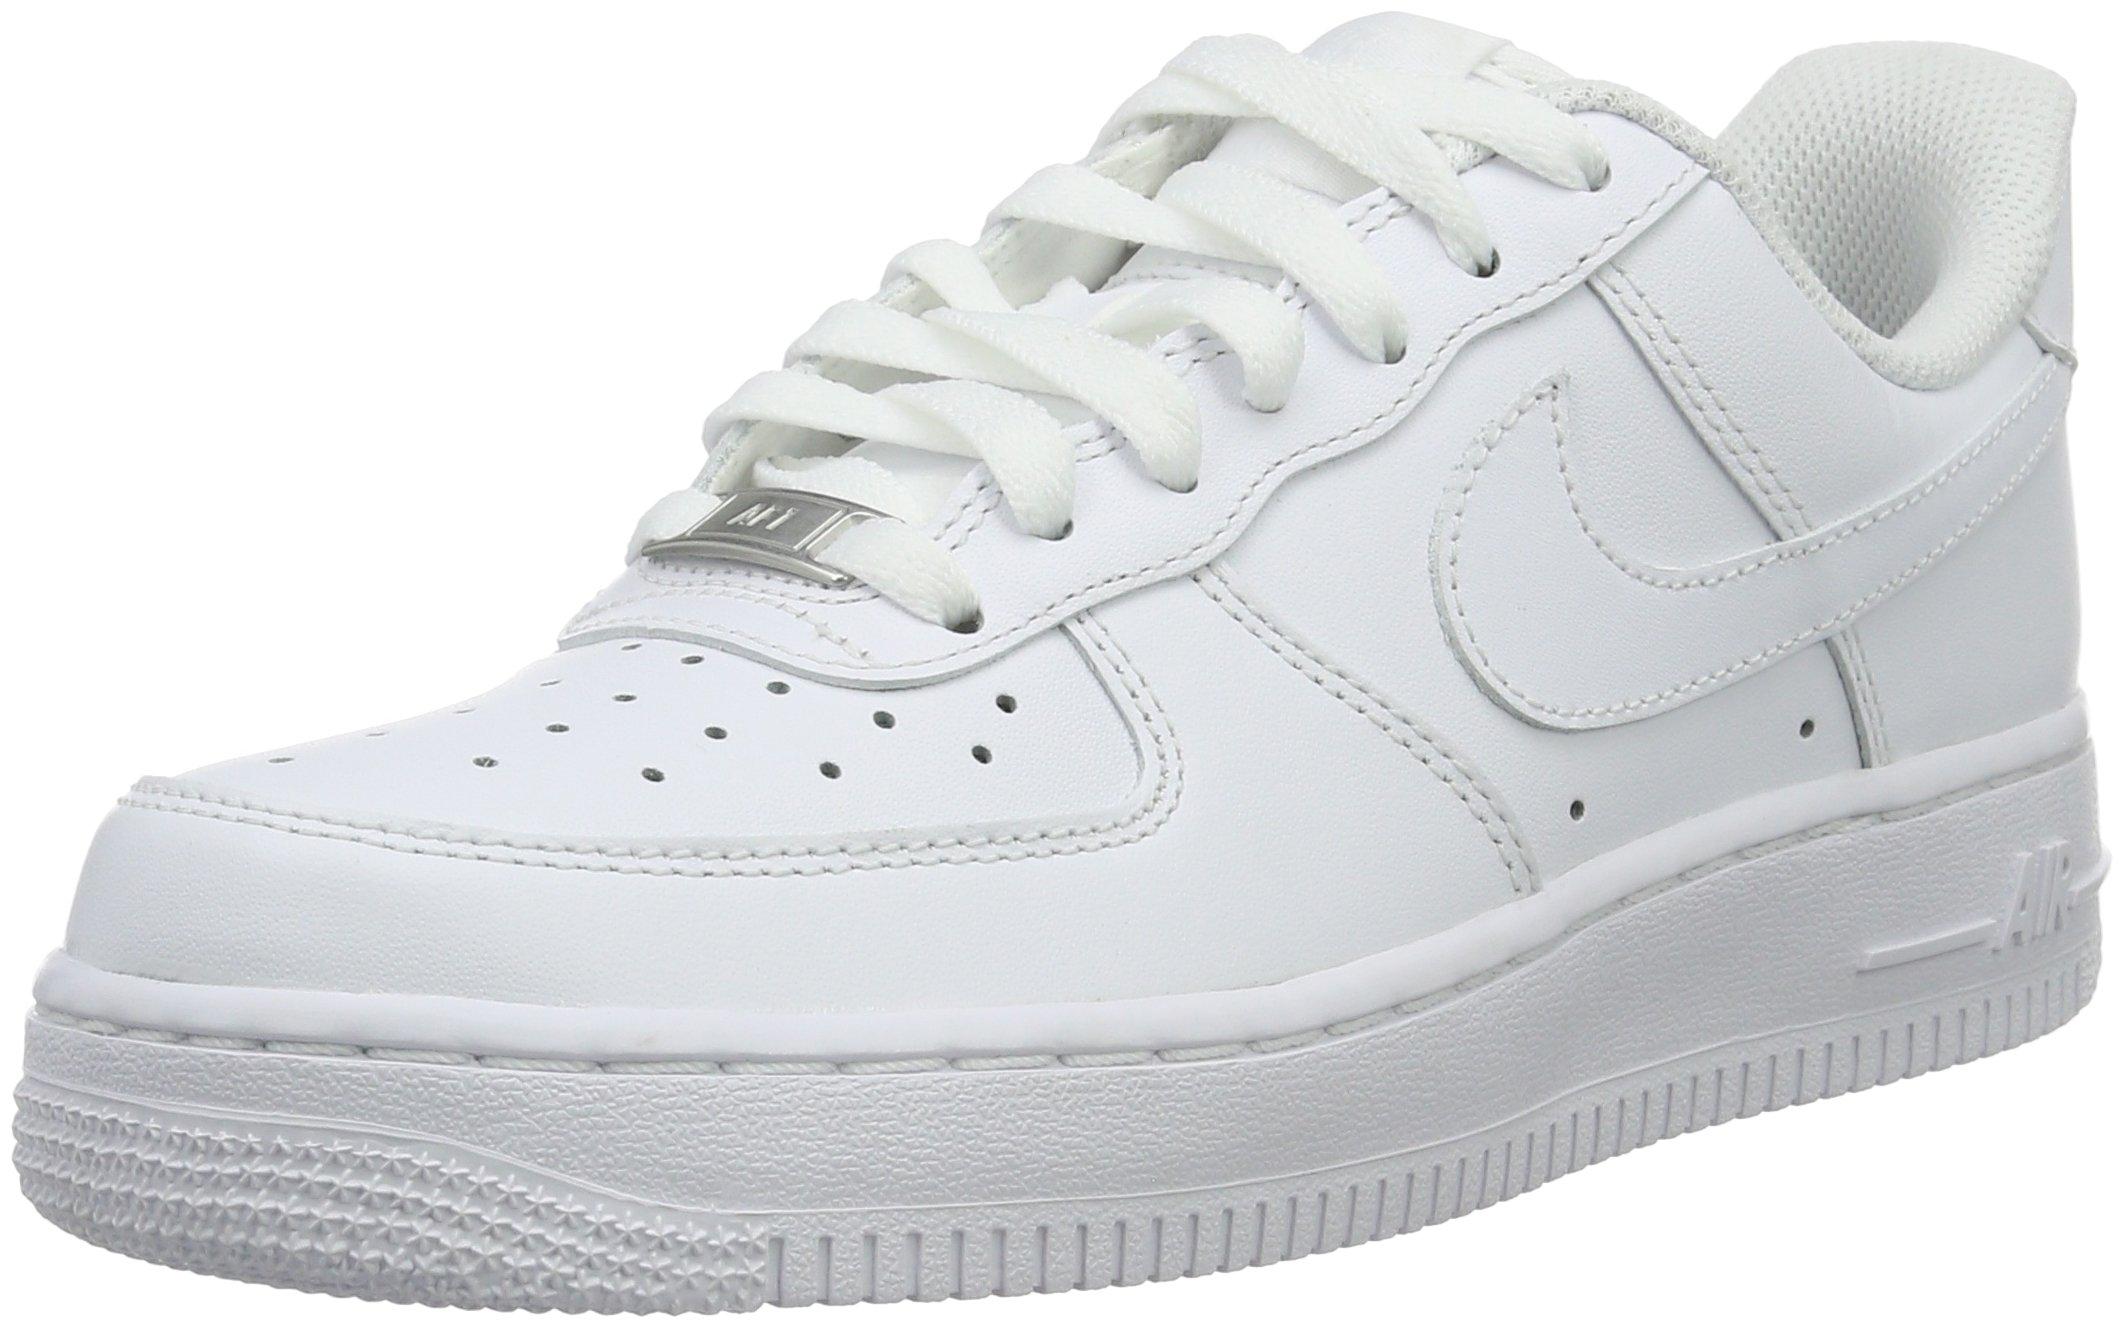 Nike [315115-112] AIR Force 1 '07 Womens Shoes White/White